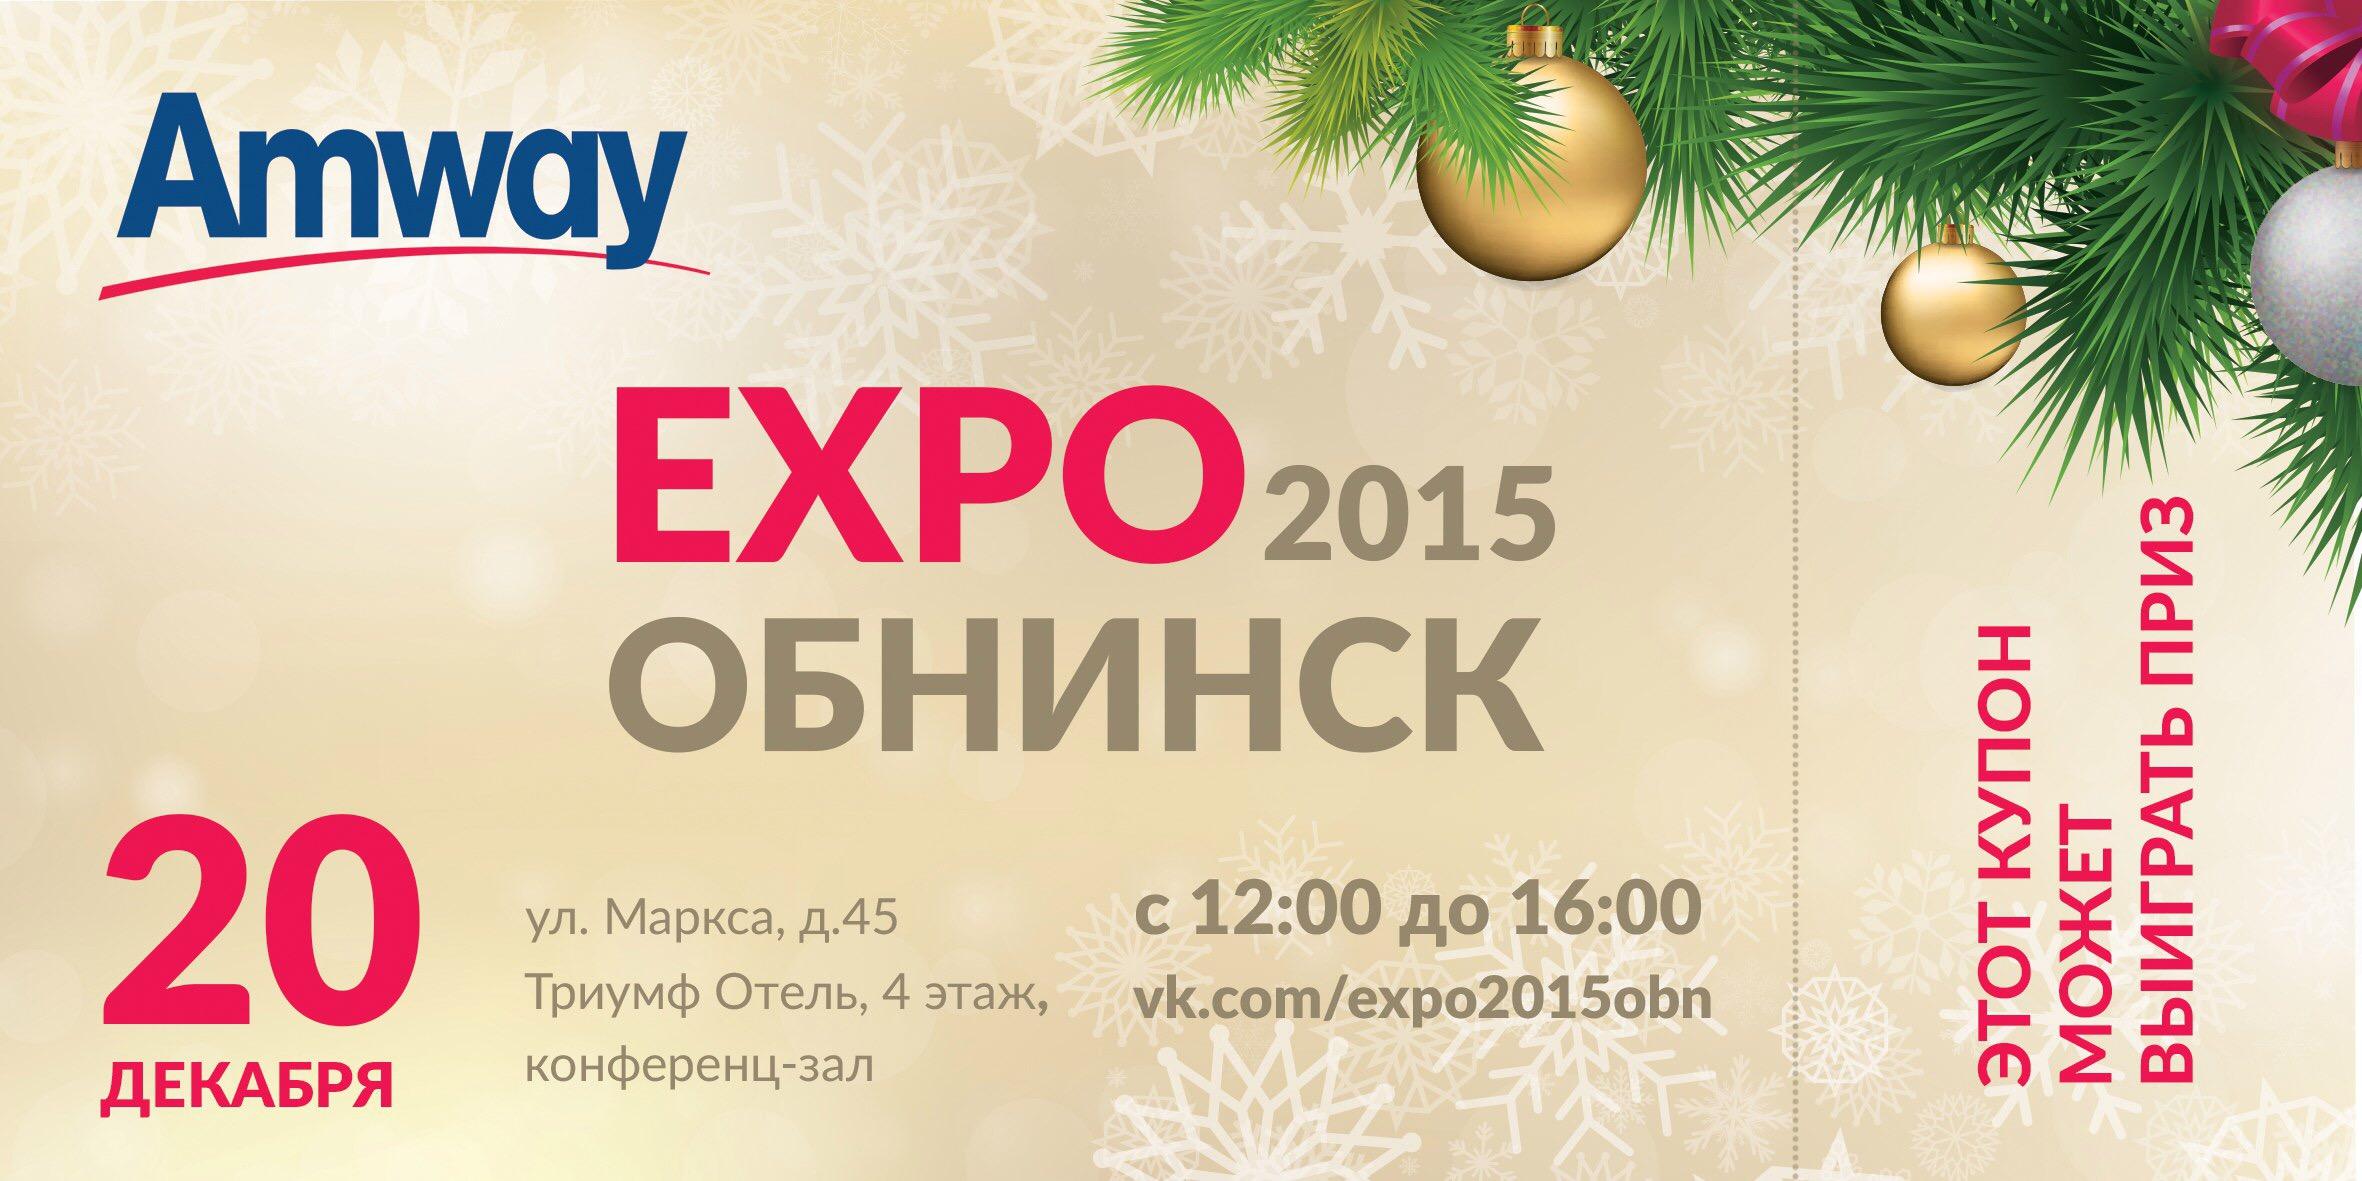 EXPO-выставка в Обнинске